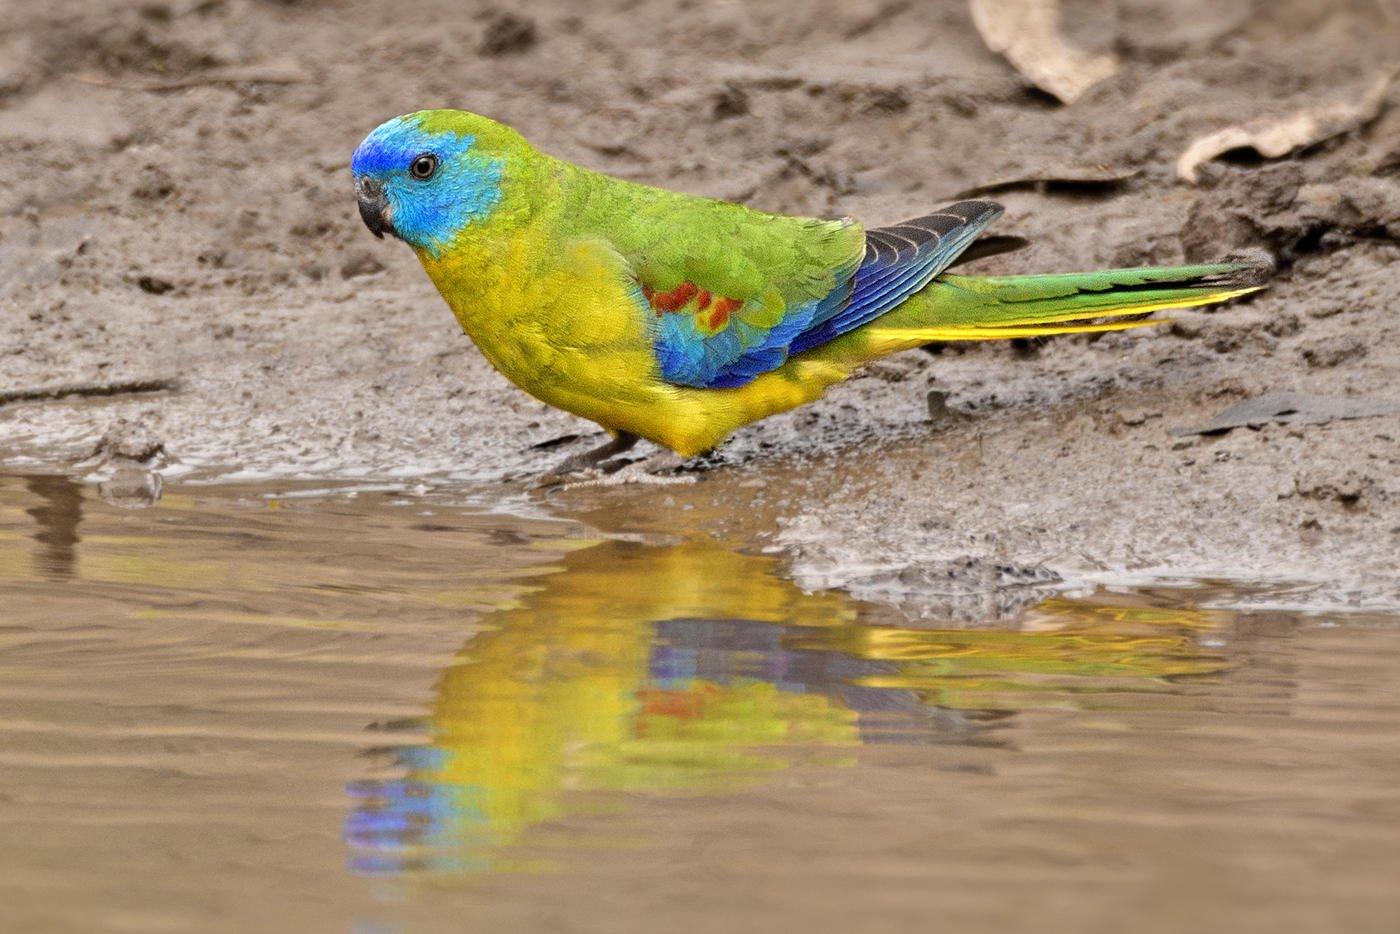 Perico turquesa (Turquoise Parrot) (Salvador Solé Soriano)